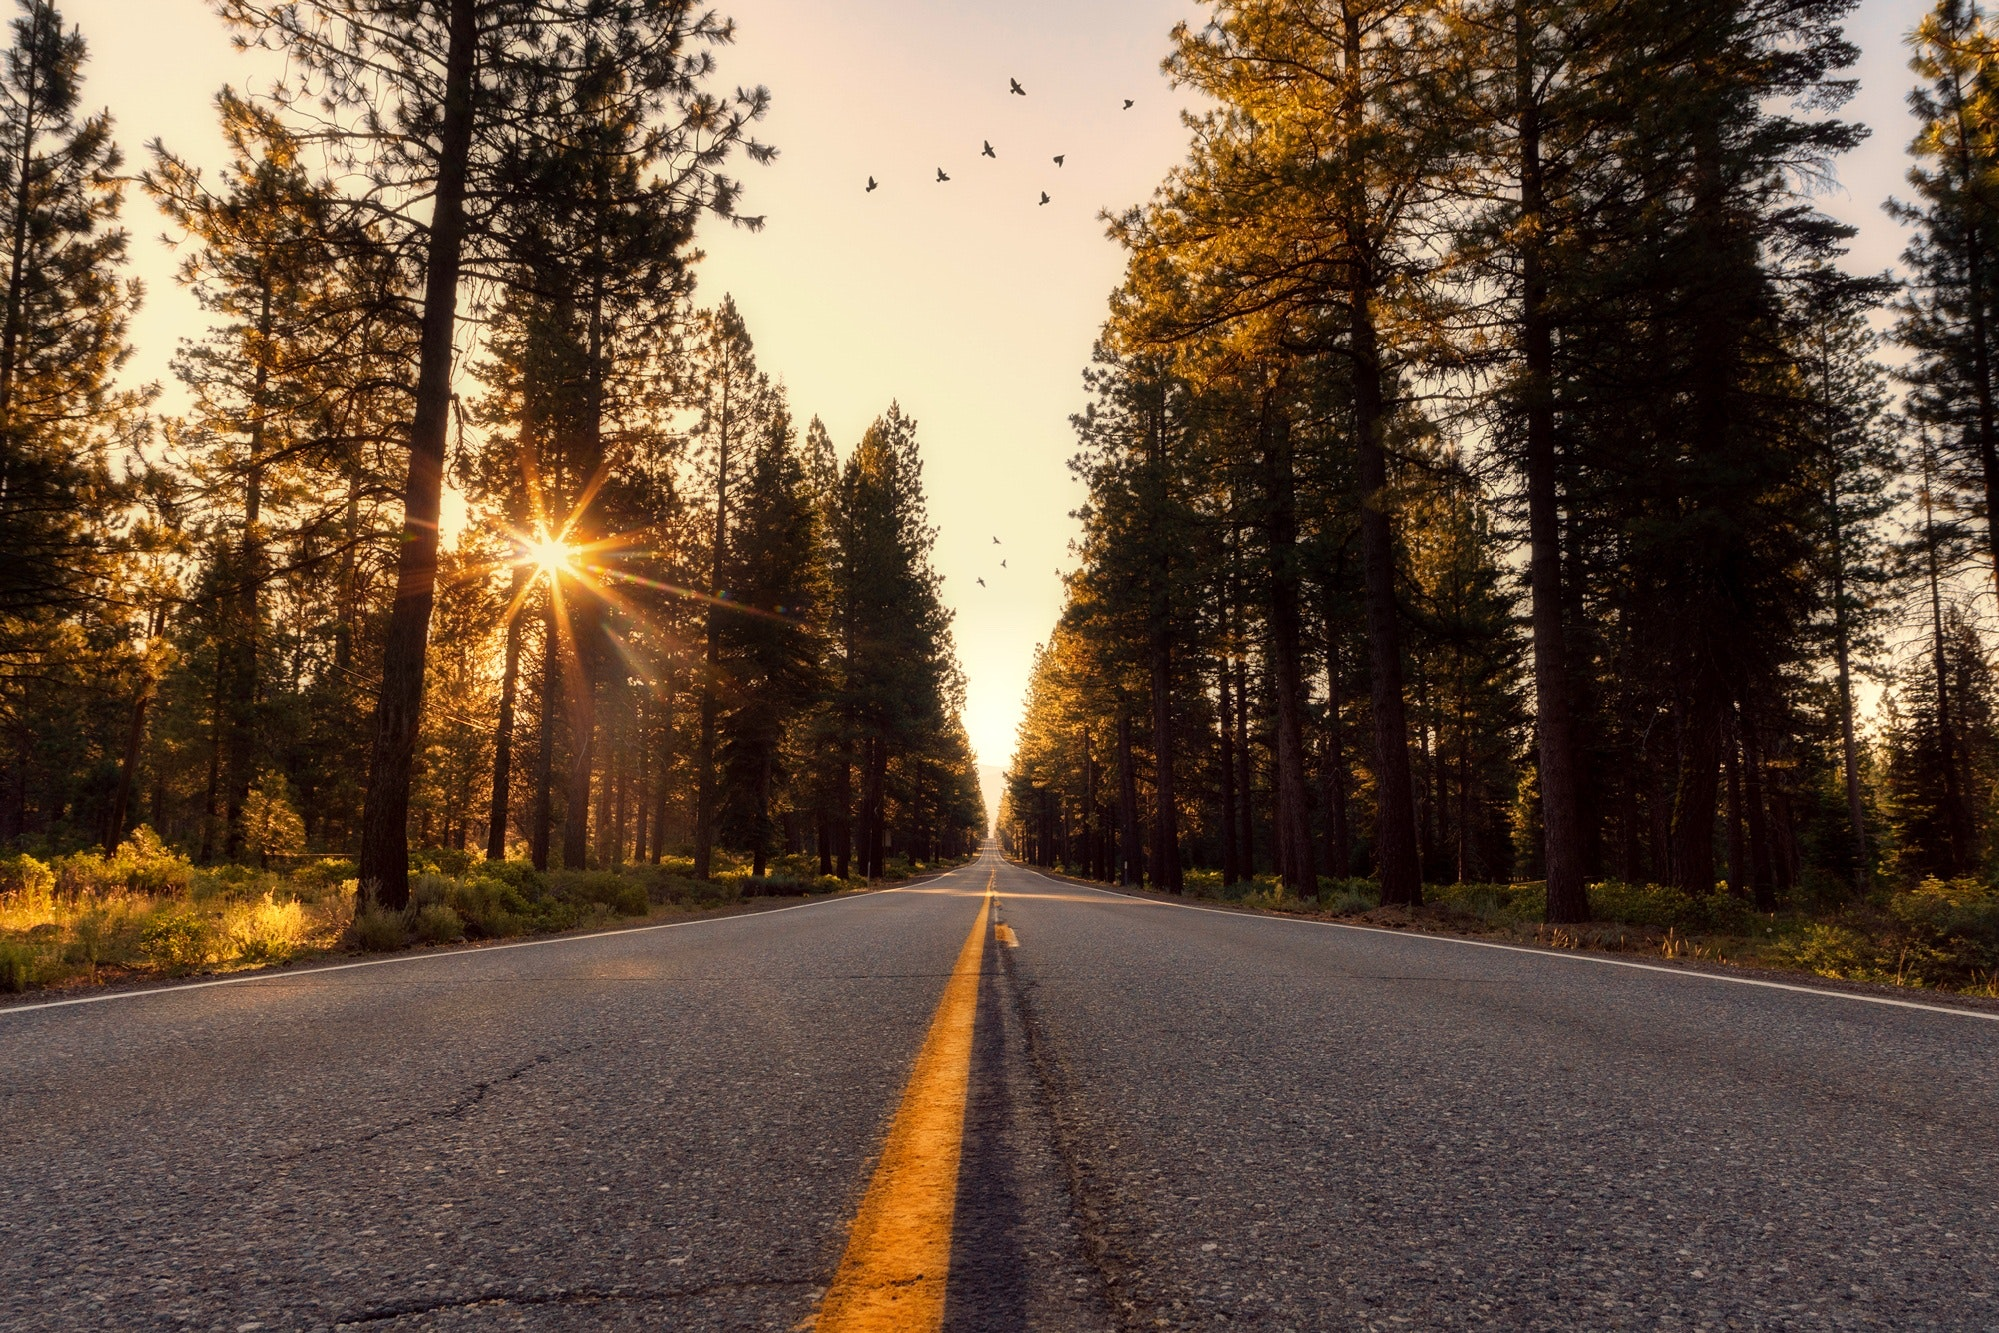 adventure-asphalt-california-533671.jpg